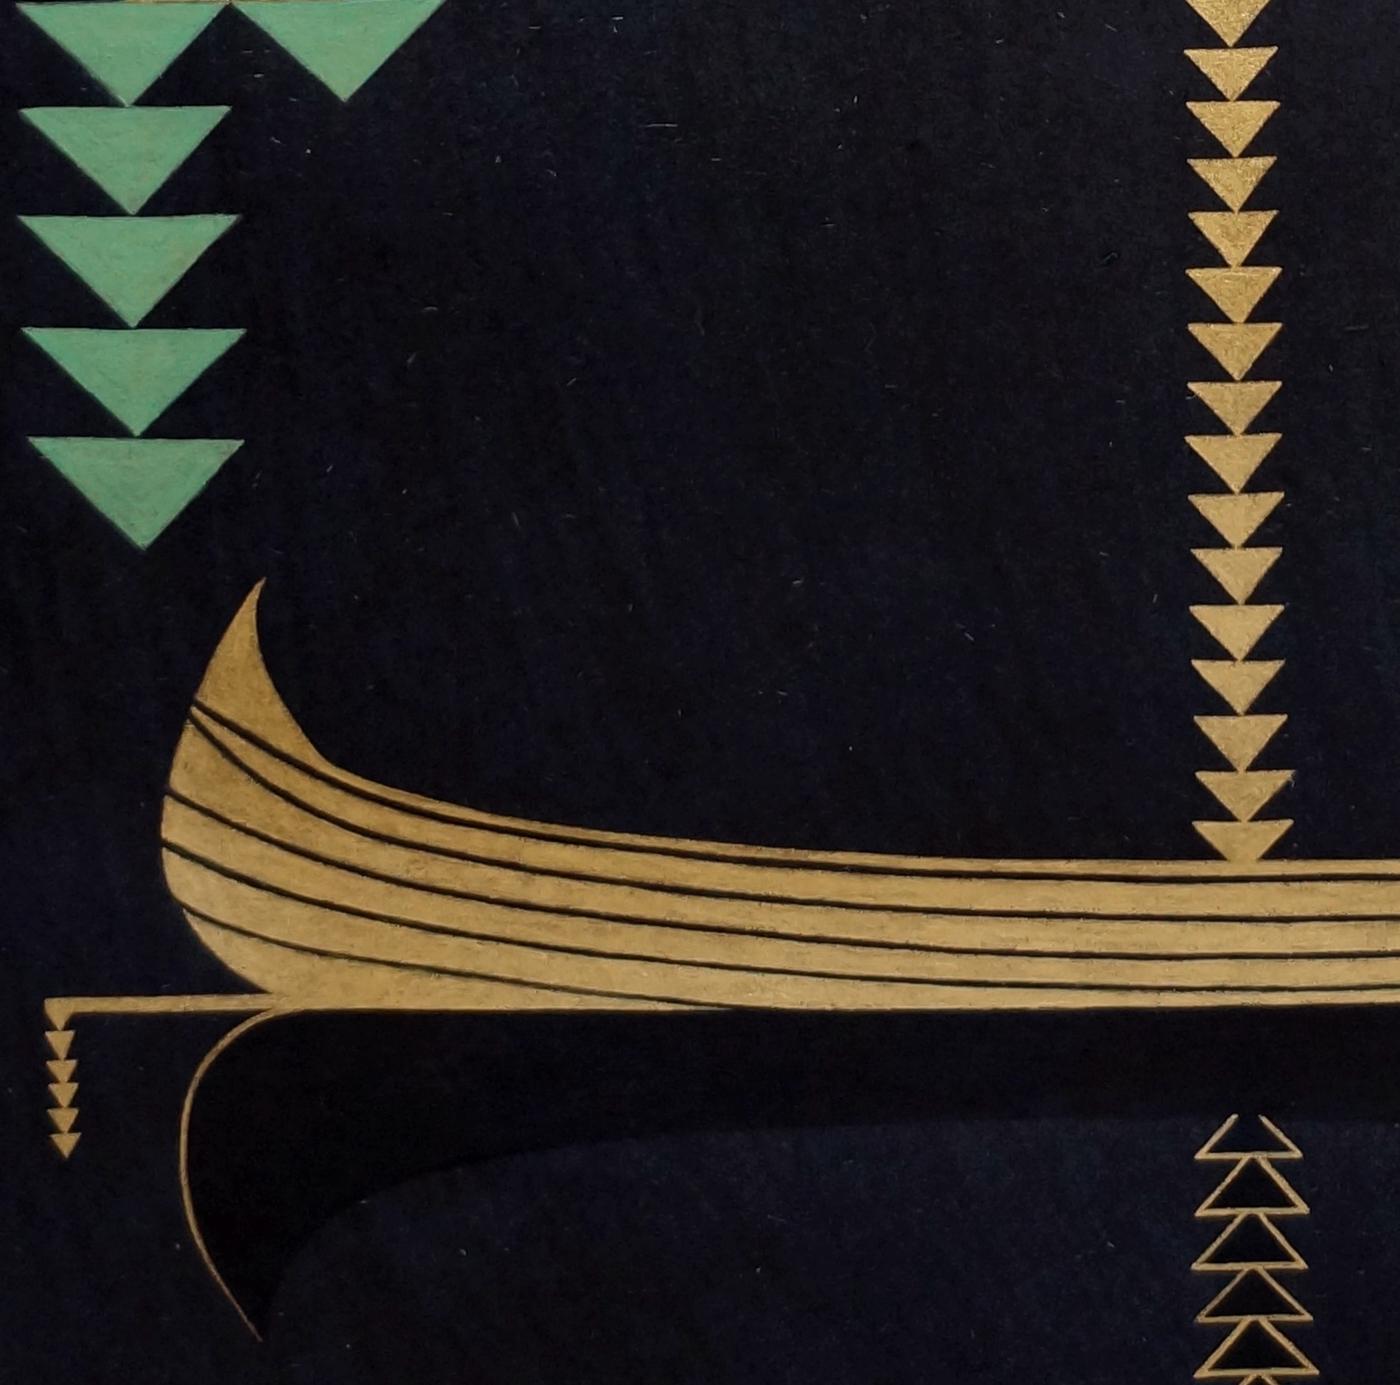 Khizrnama (Bark) , 2013  detail  24-karat gold and malachite on handmade indigo wasli paper  17 x 13 inches